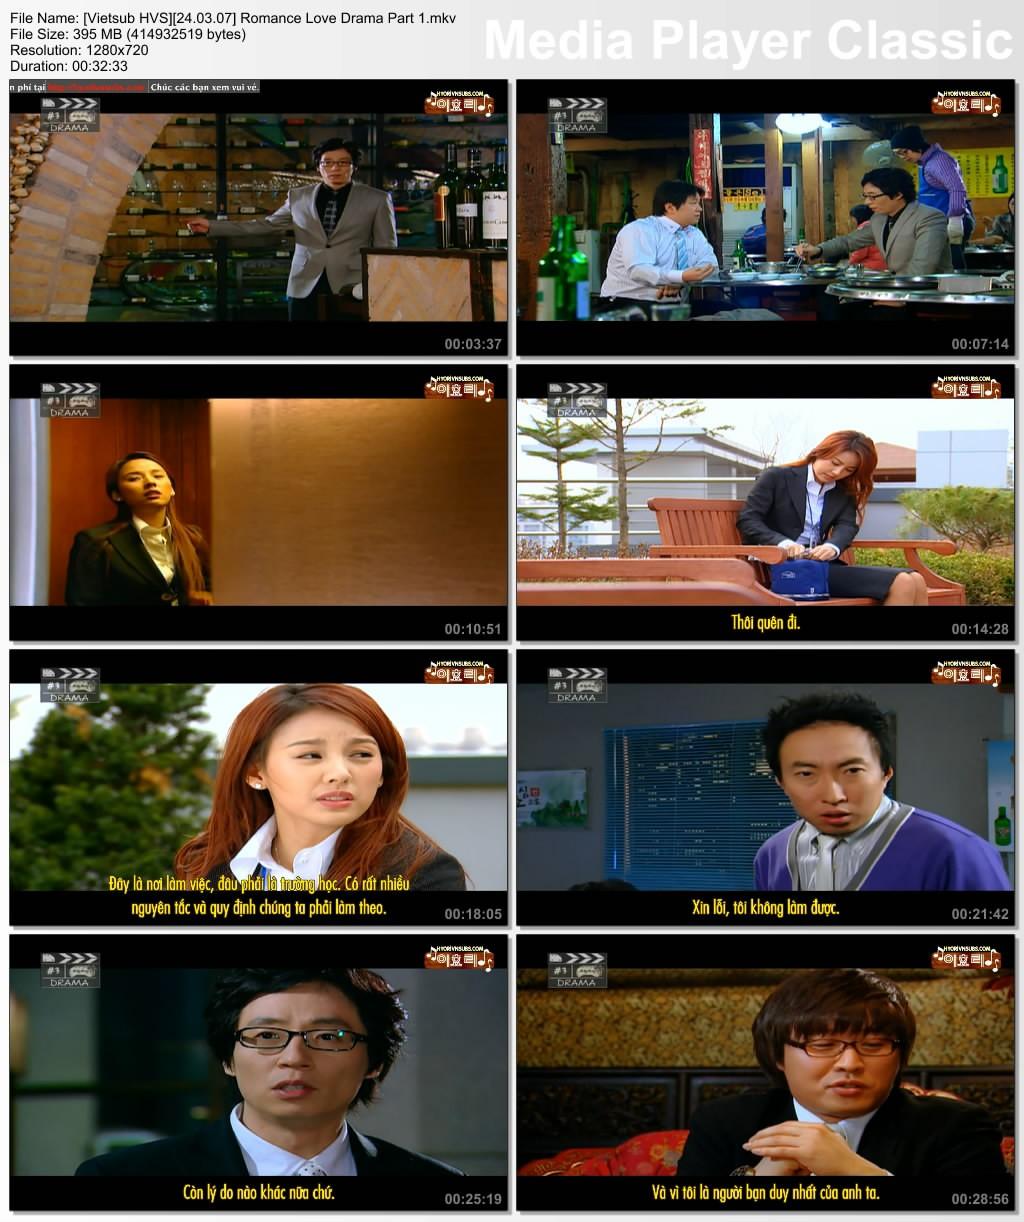 [Vietsub][24.03.07] Romance Love Drama (Starring: Lee Hyori, Yoo Jae Suk, Haha, Park Myung Soo...) Vietsu64